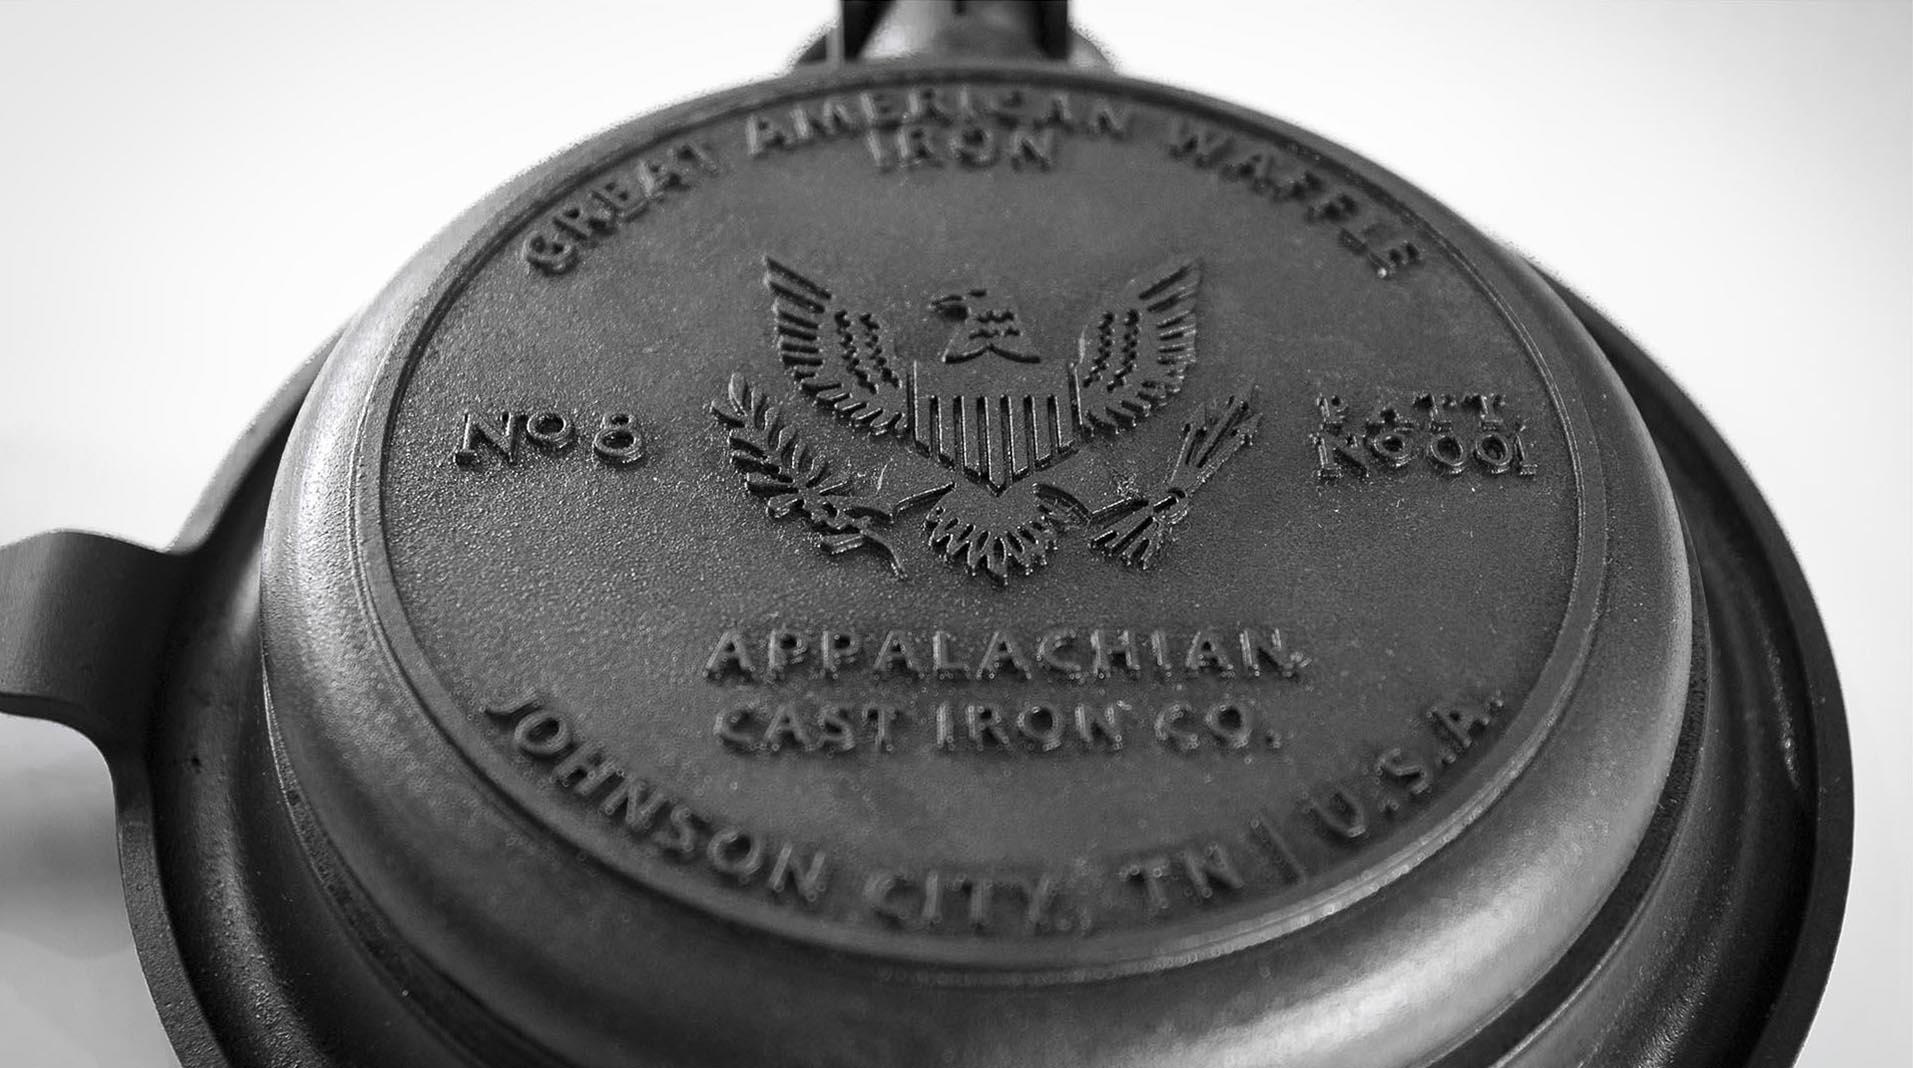 Great American Waffle Iron patriotic design detail